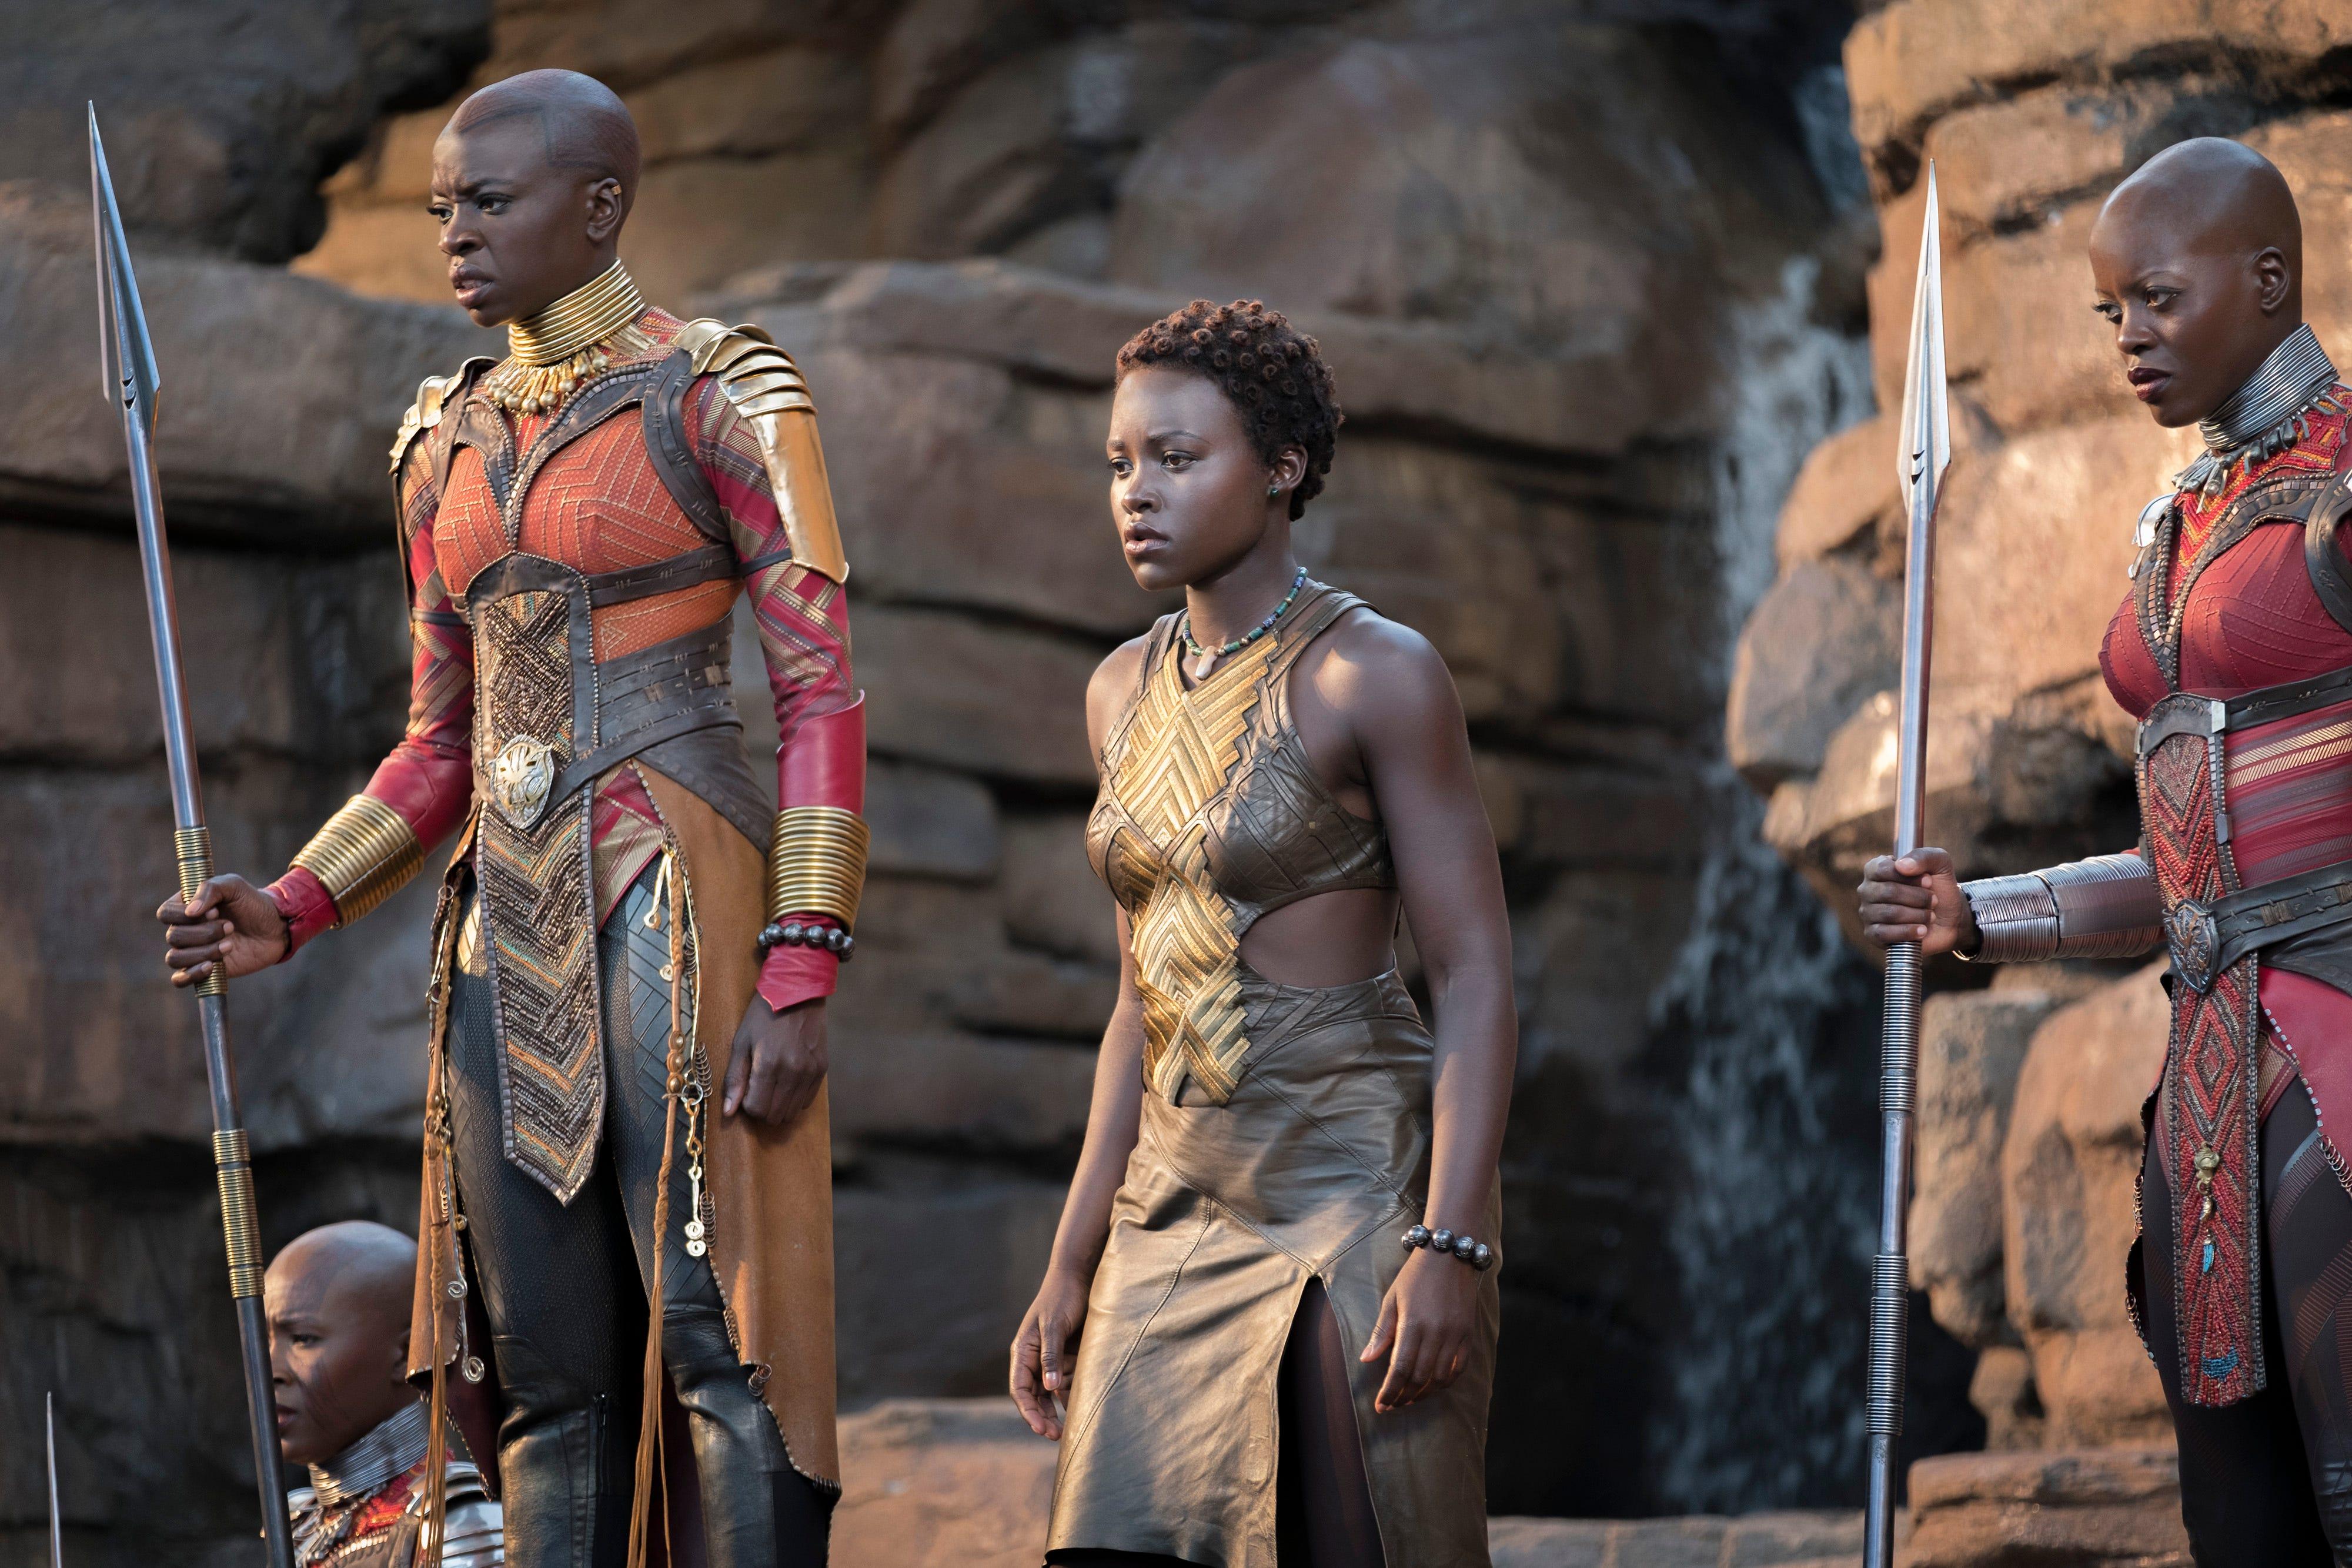 Black Panther New Still Features Danai Gurira And Lupita